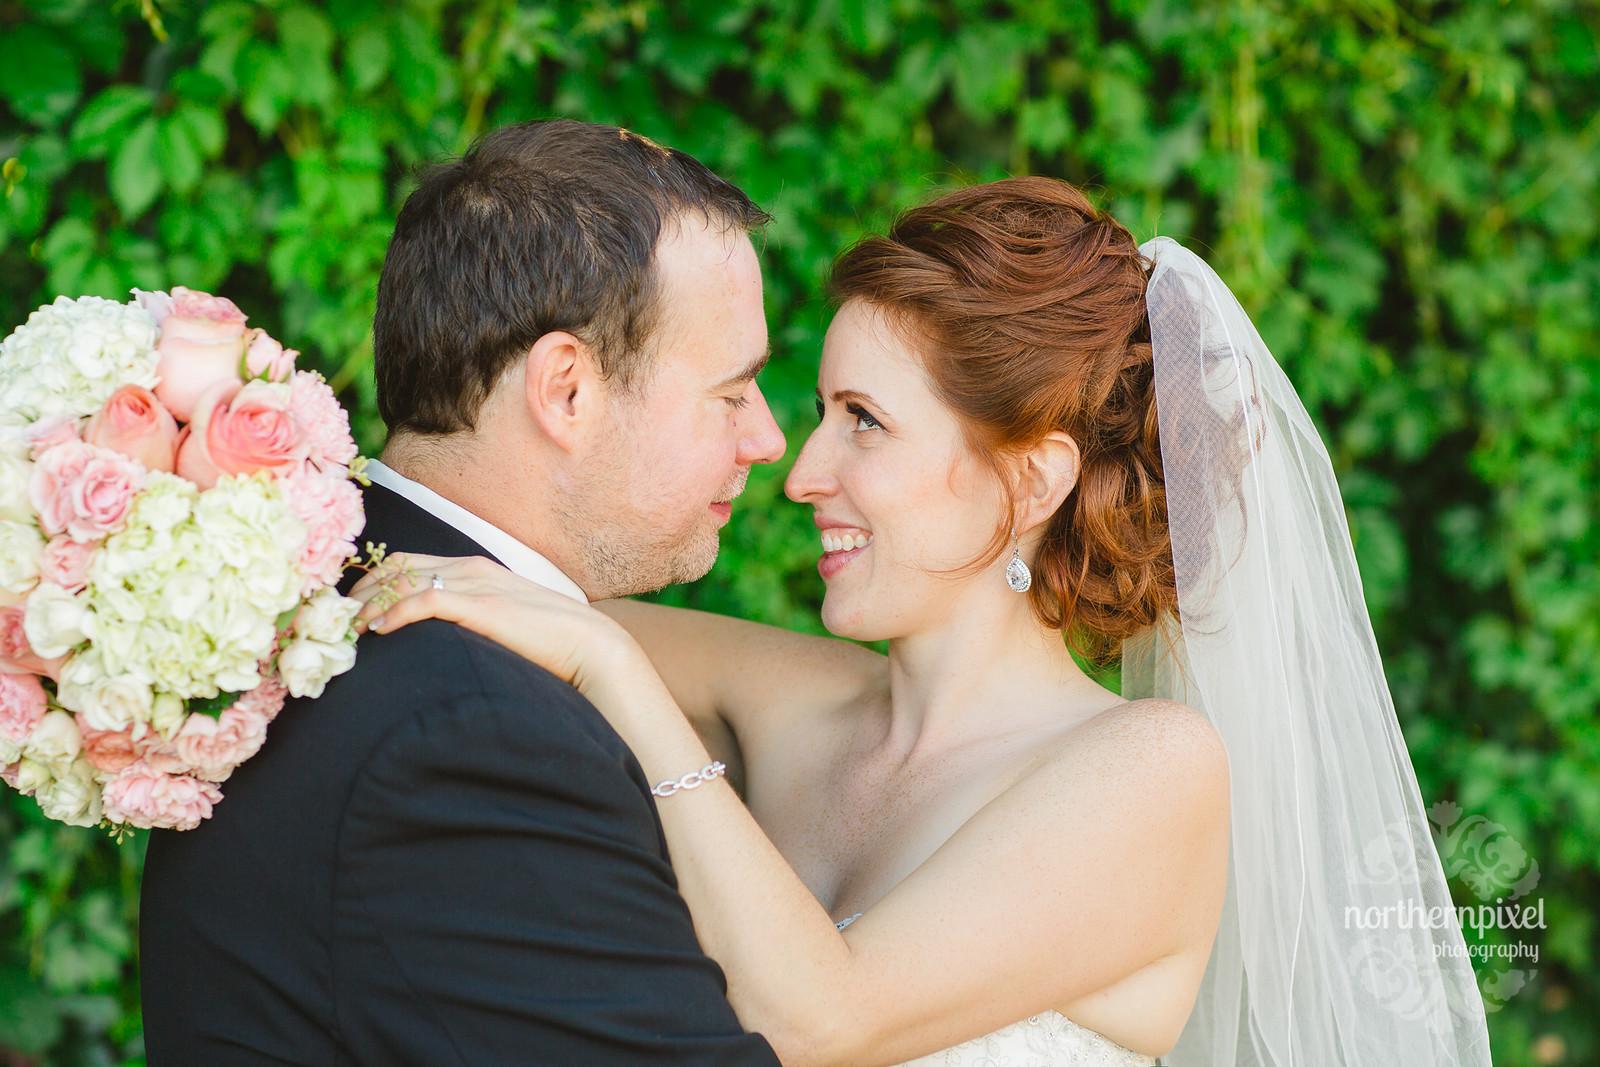 Kendra & Jarrett on their Wedding Day - in Prince George BC